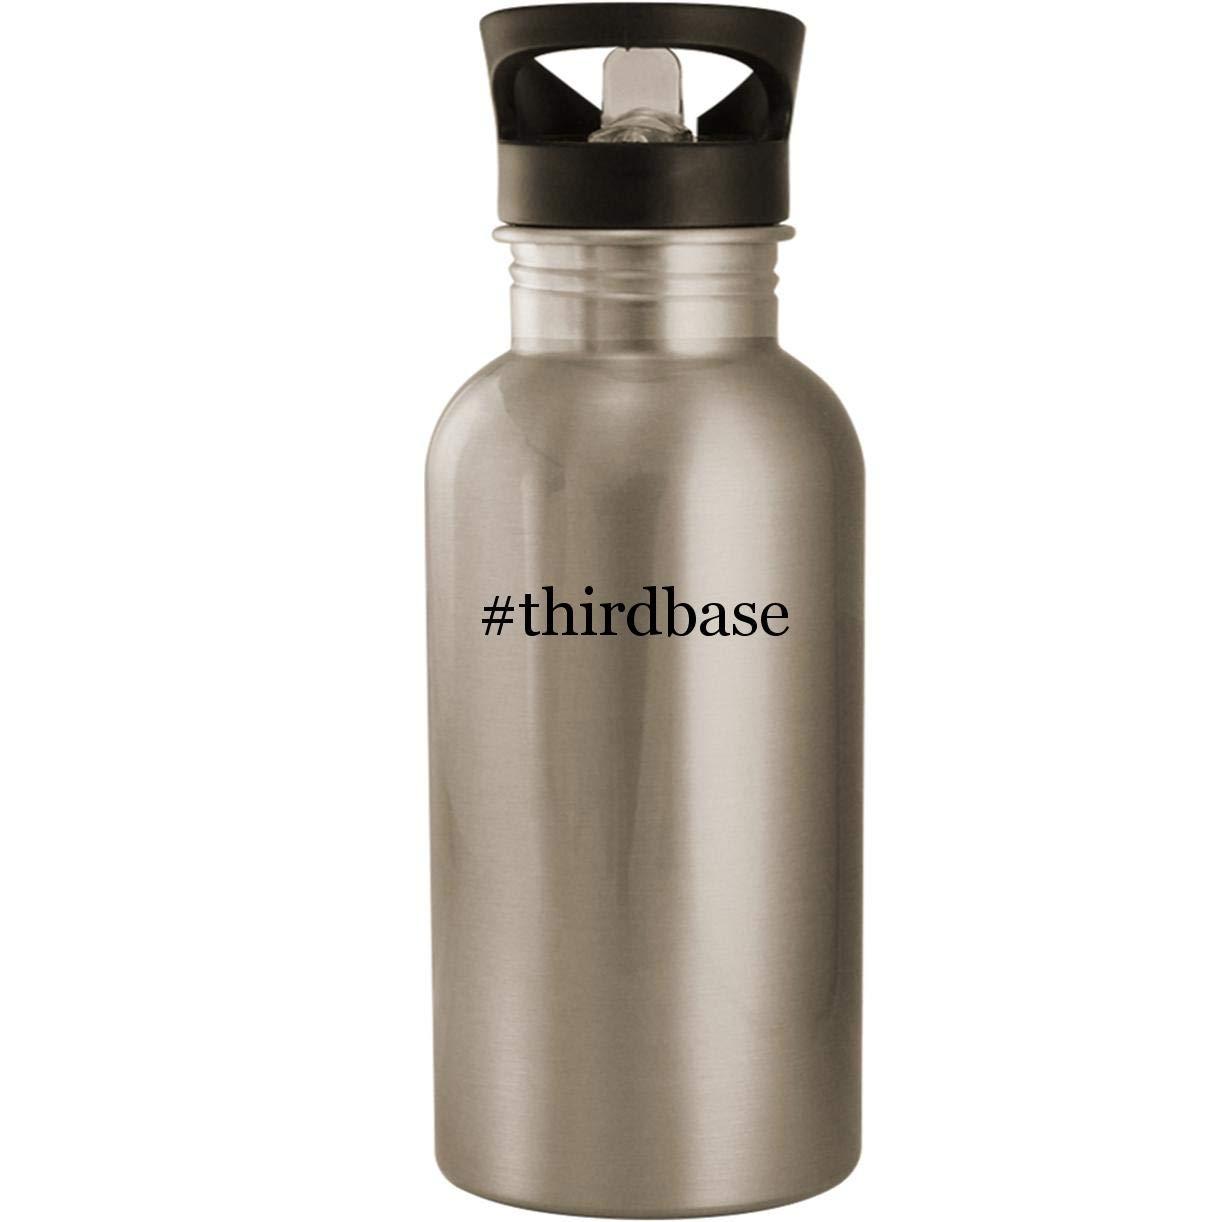 #thirdbase – ステンレススチール 20オンス ロードレディウォーターボトル シルバー US-C-07-18-02-094307-04-26-18-26 B07GN9VZBN  シルバー